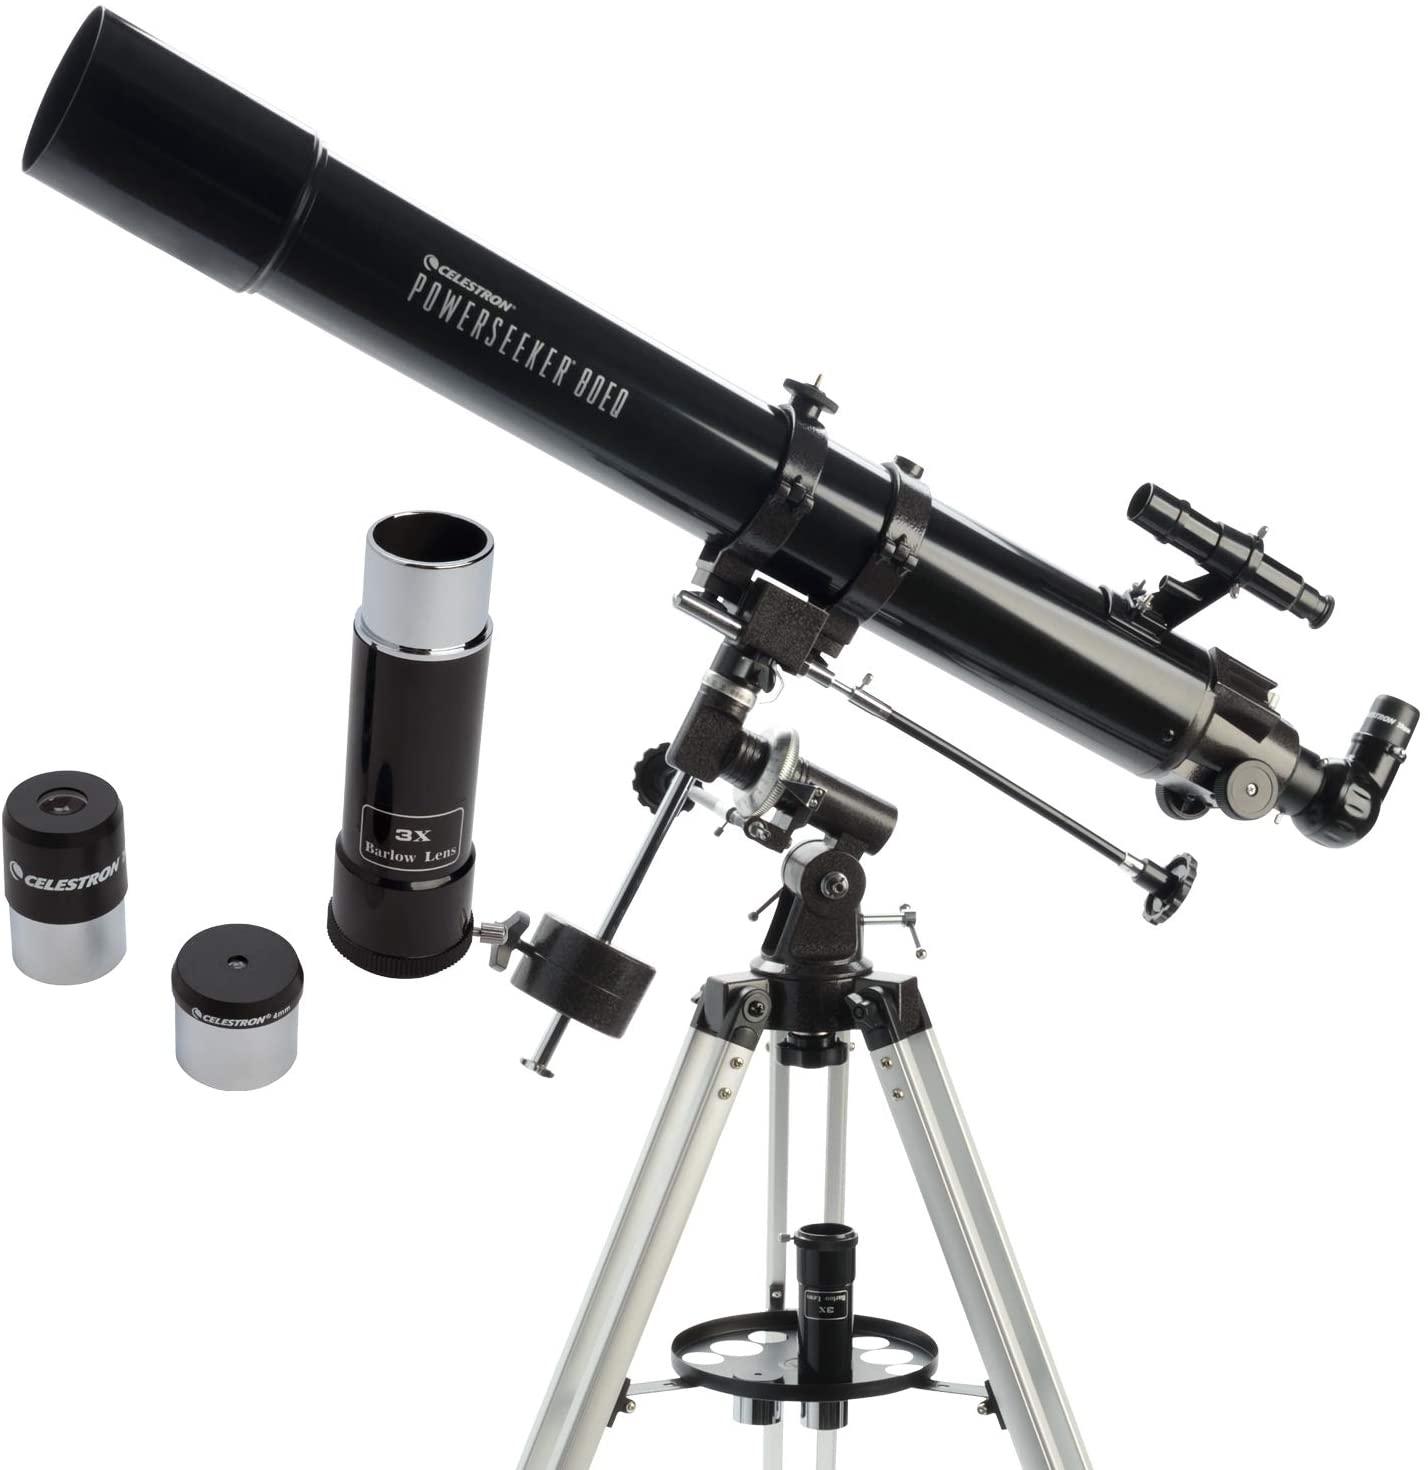 Celestron PowerSeeker 80EQ Telescope £79.99 delivered at Costco